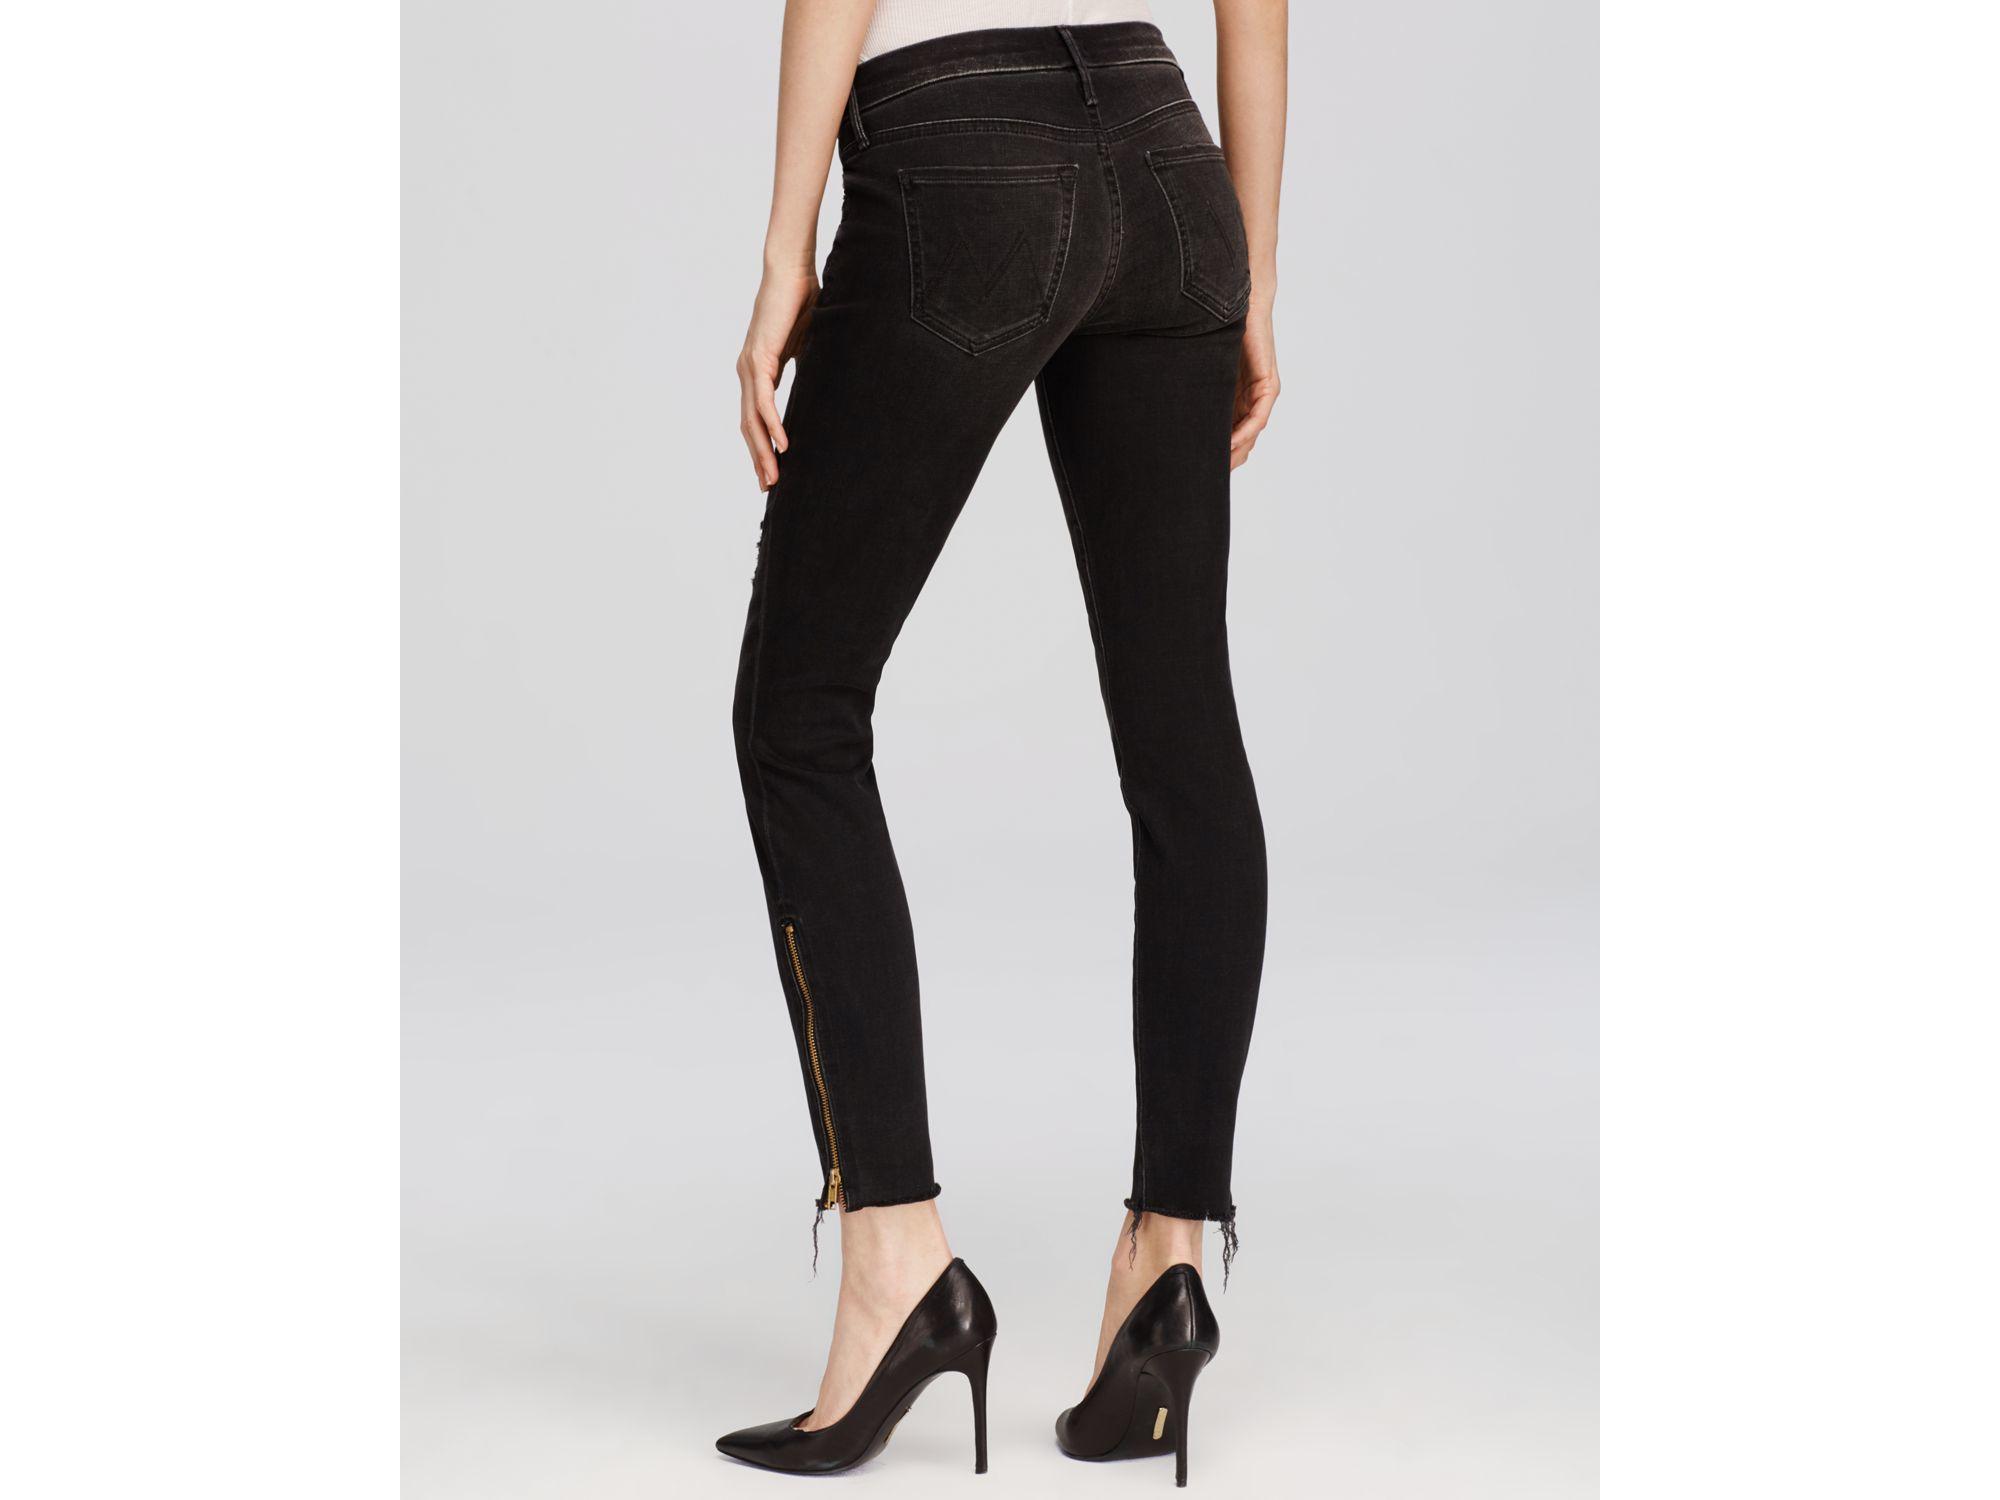 Looker Hauteur Moyenne De Jeans Skinny - Mère Denim Foncé 8tAGD8wrZS